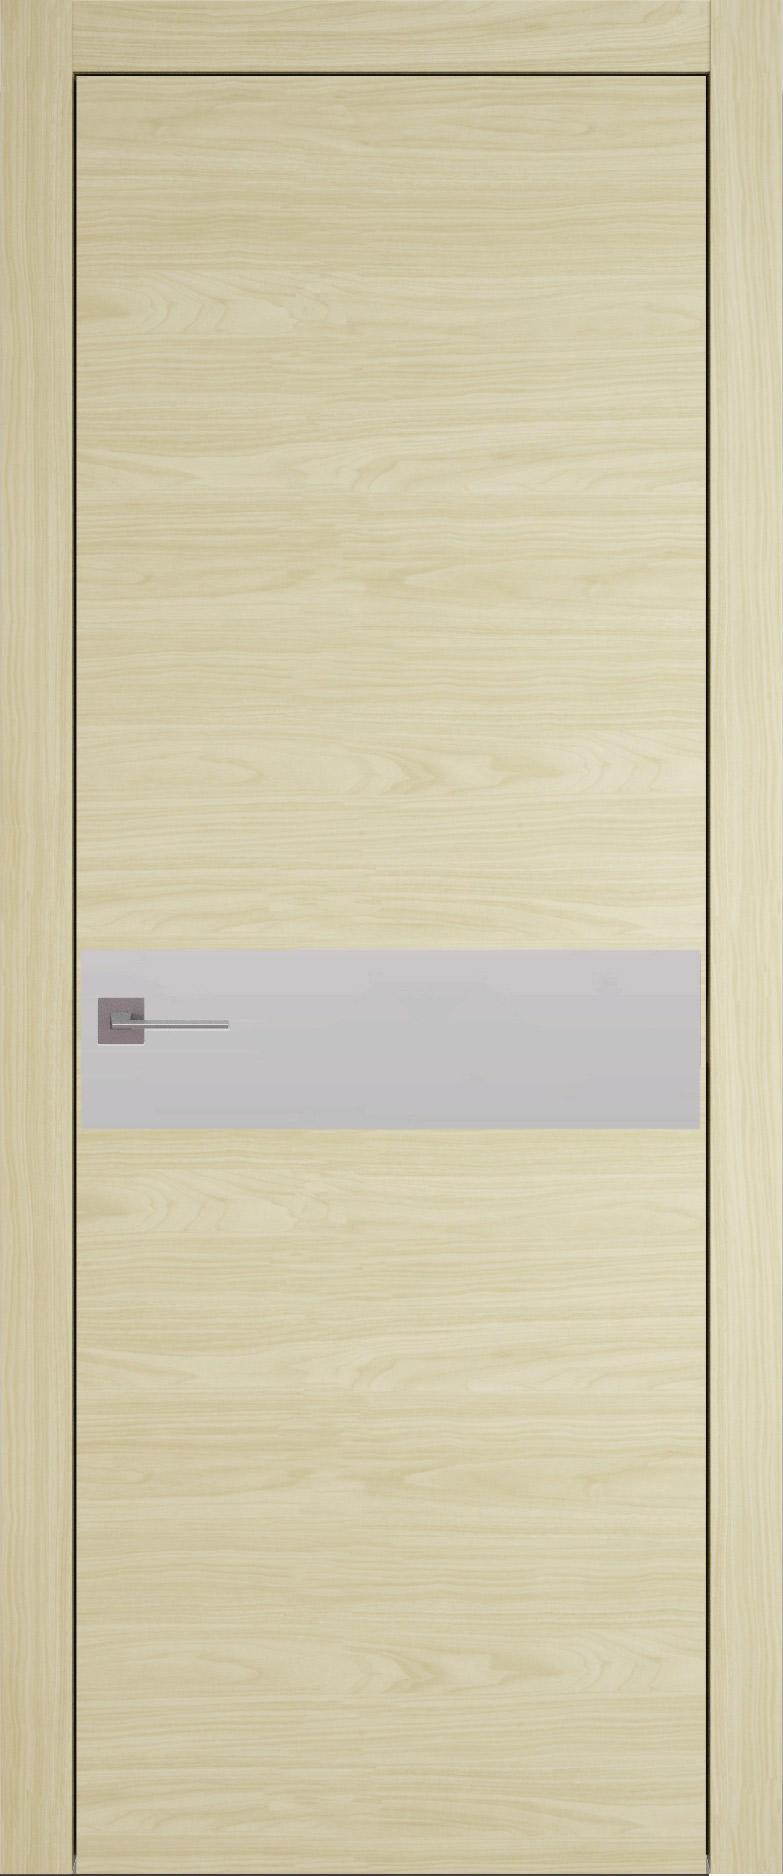 Tivoli И-4 цвет - Дуб нордик Без стекла (ДГ)